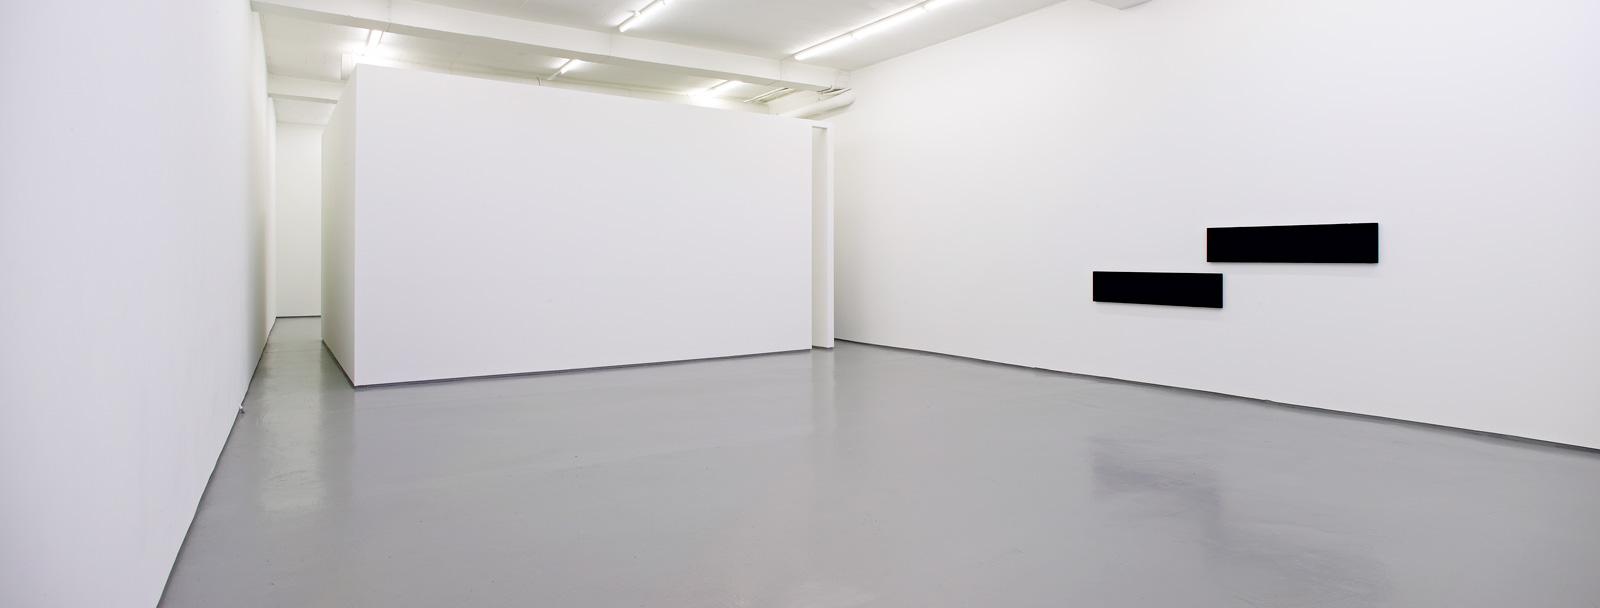 Installation view, Günter Umberg, Bilderhaus 4, Galleri Riis, Oslo, 2007